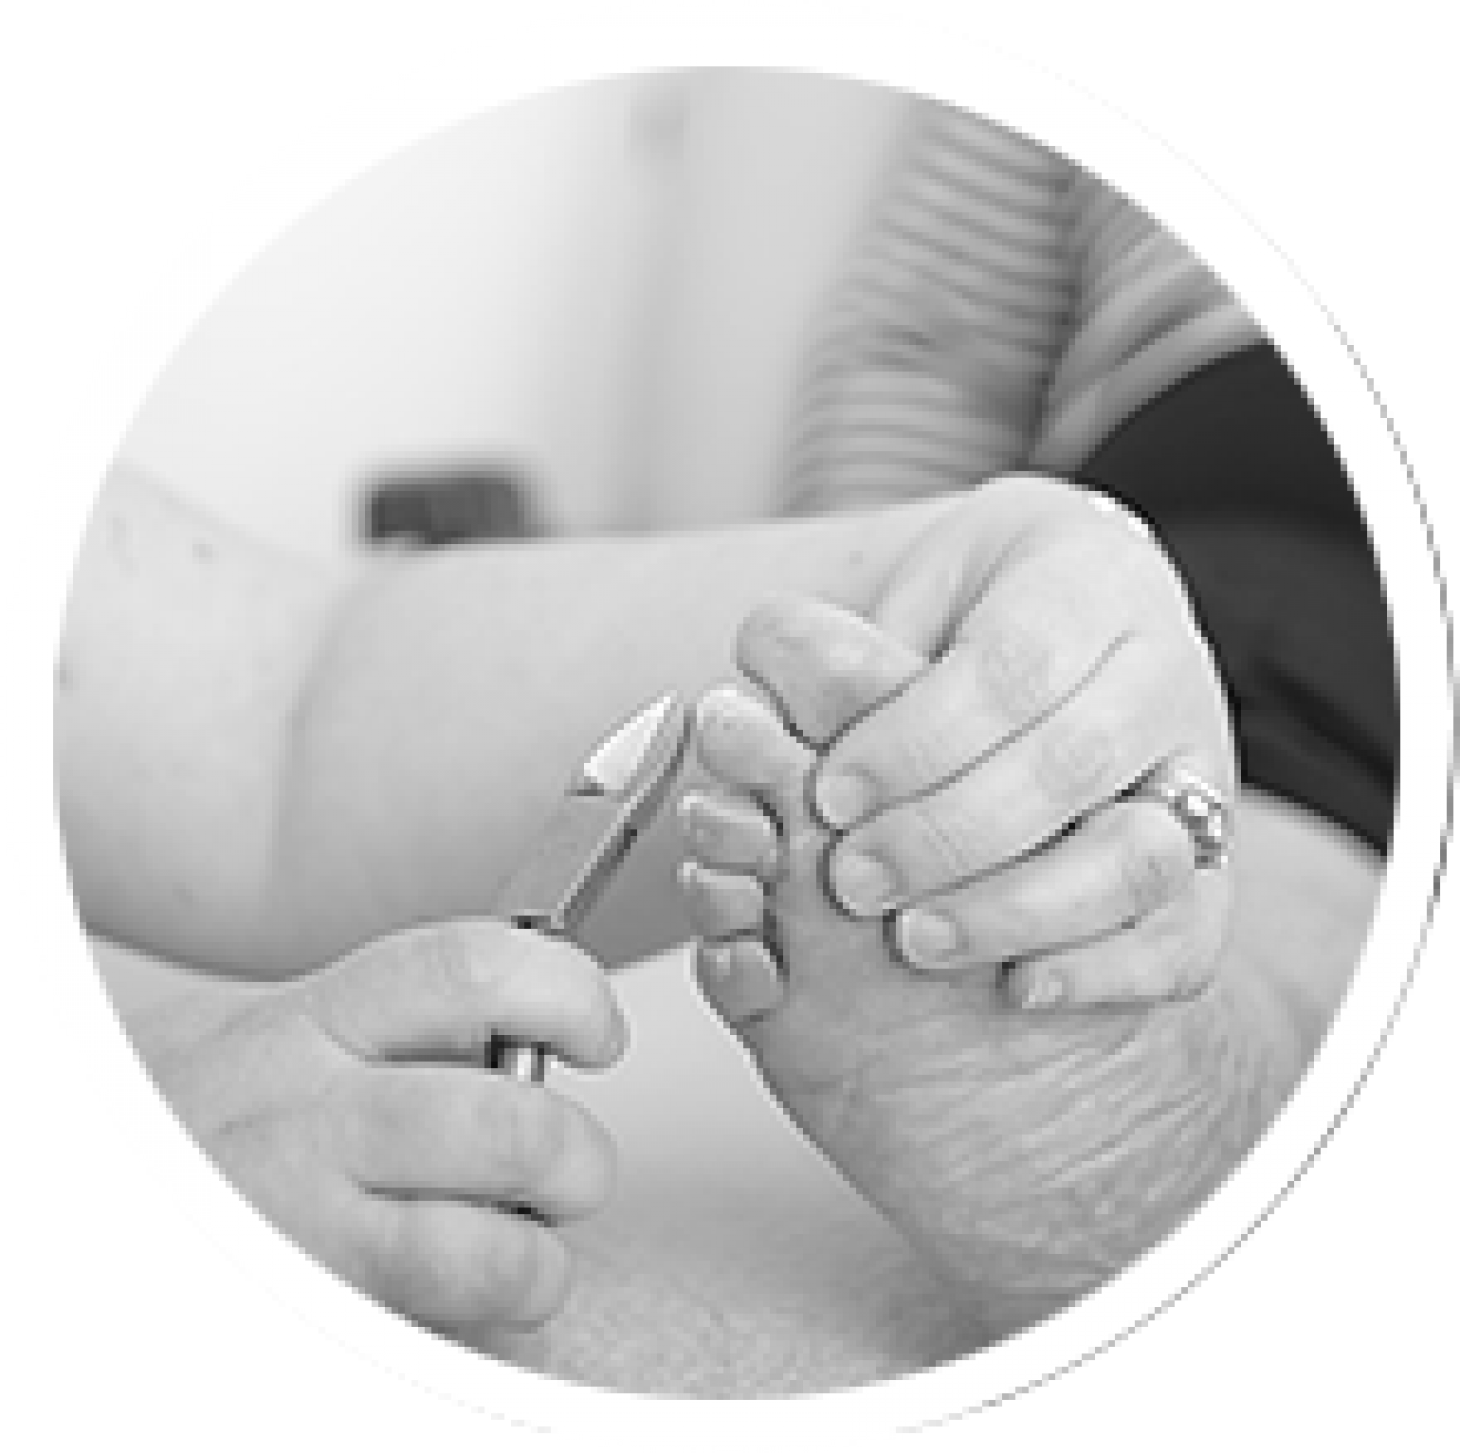 geriatric care at Dalkey Podiatry Clinic, Dalkey